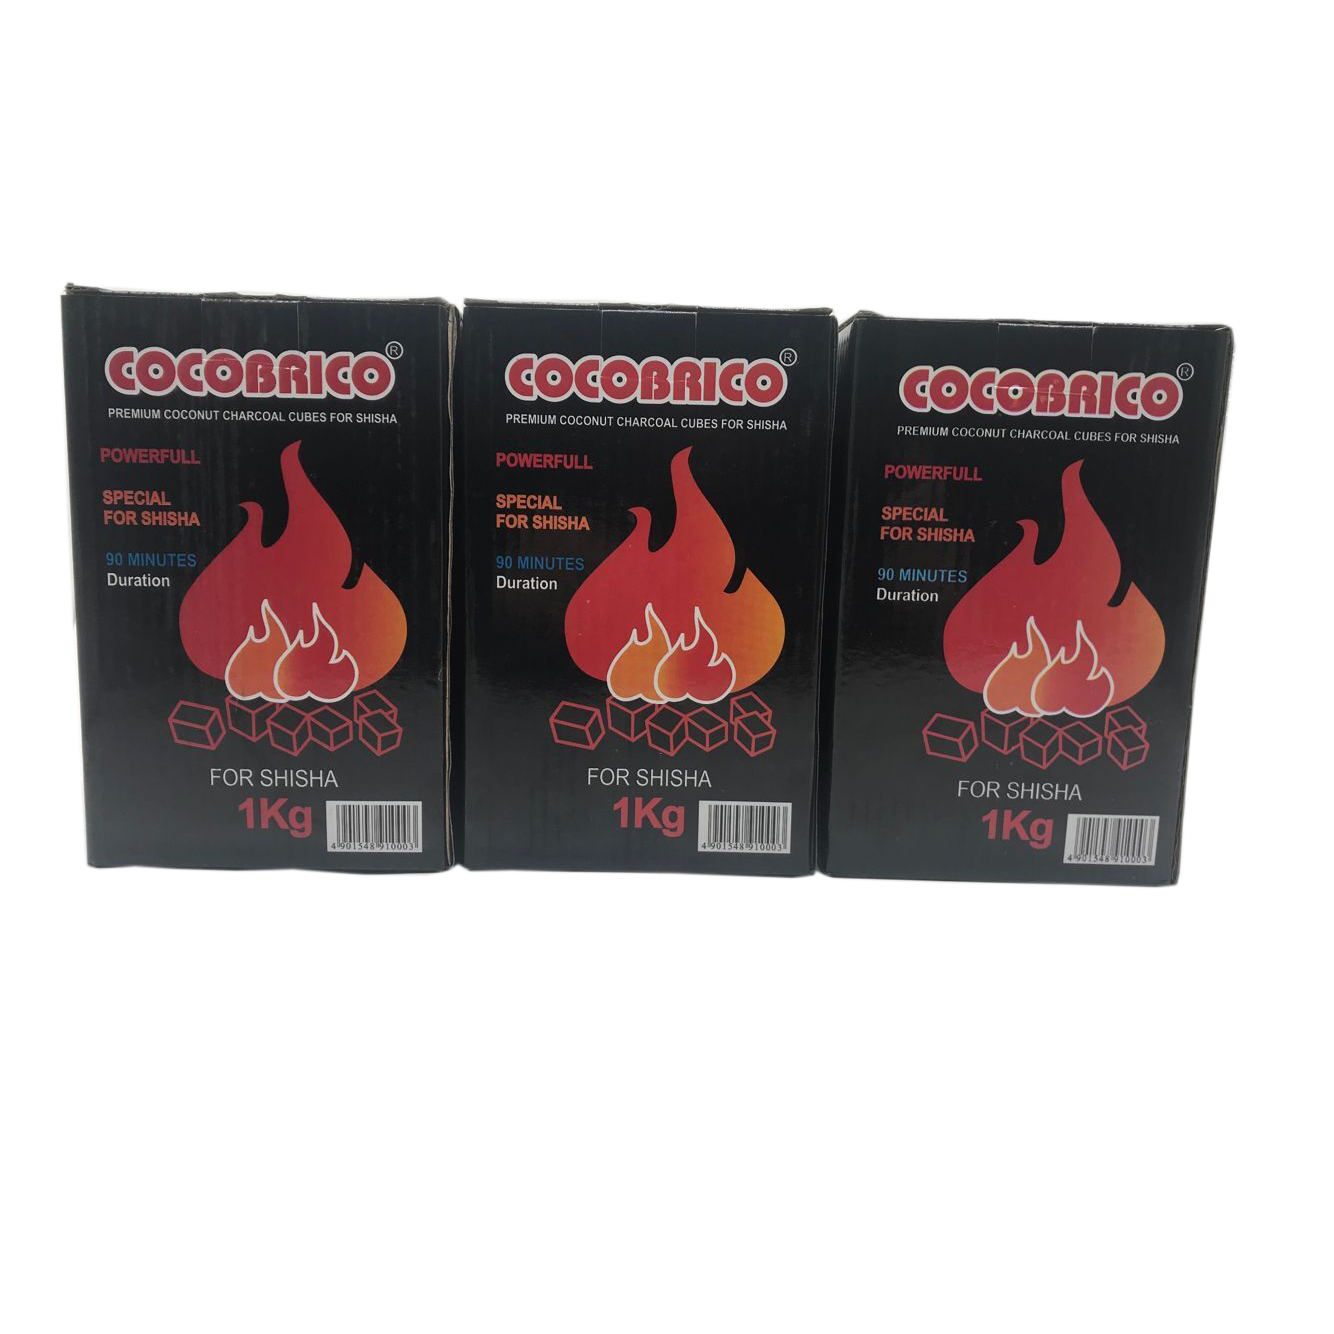 HQHC0022 HongQiang Free Samples Cocobrico Cubes Coconut Shell Hookah Charcoal for Shisha